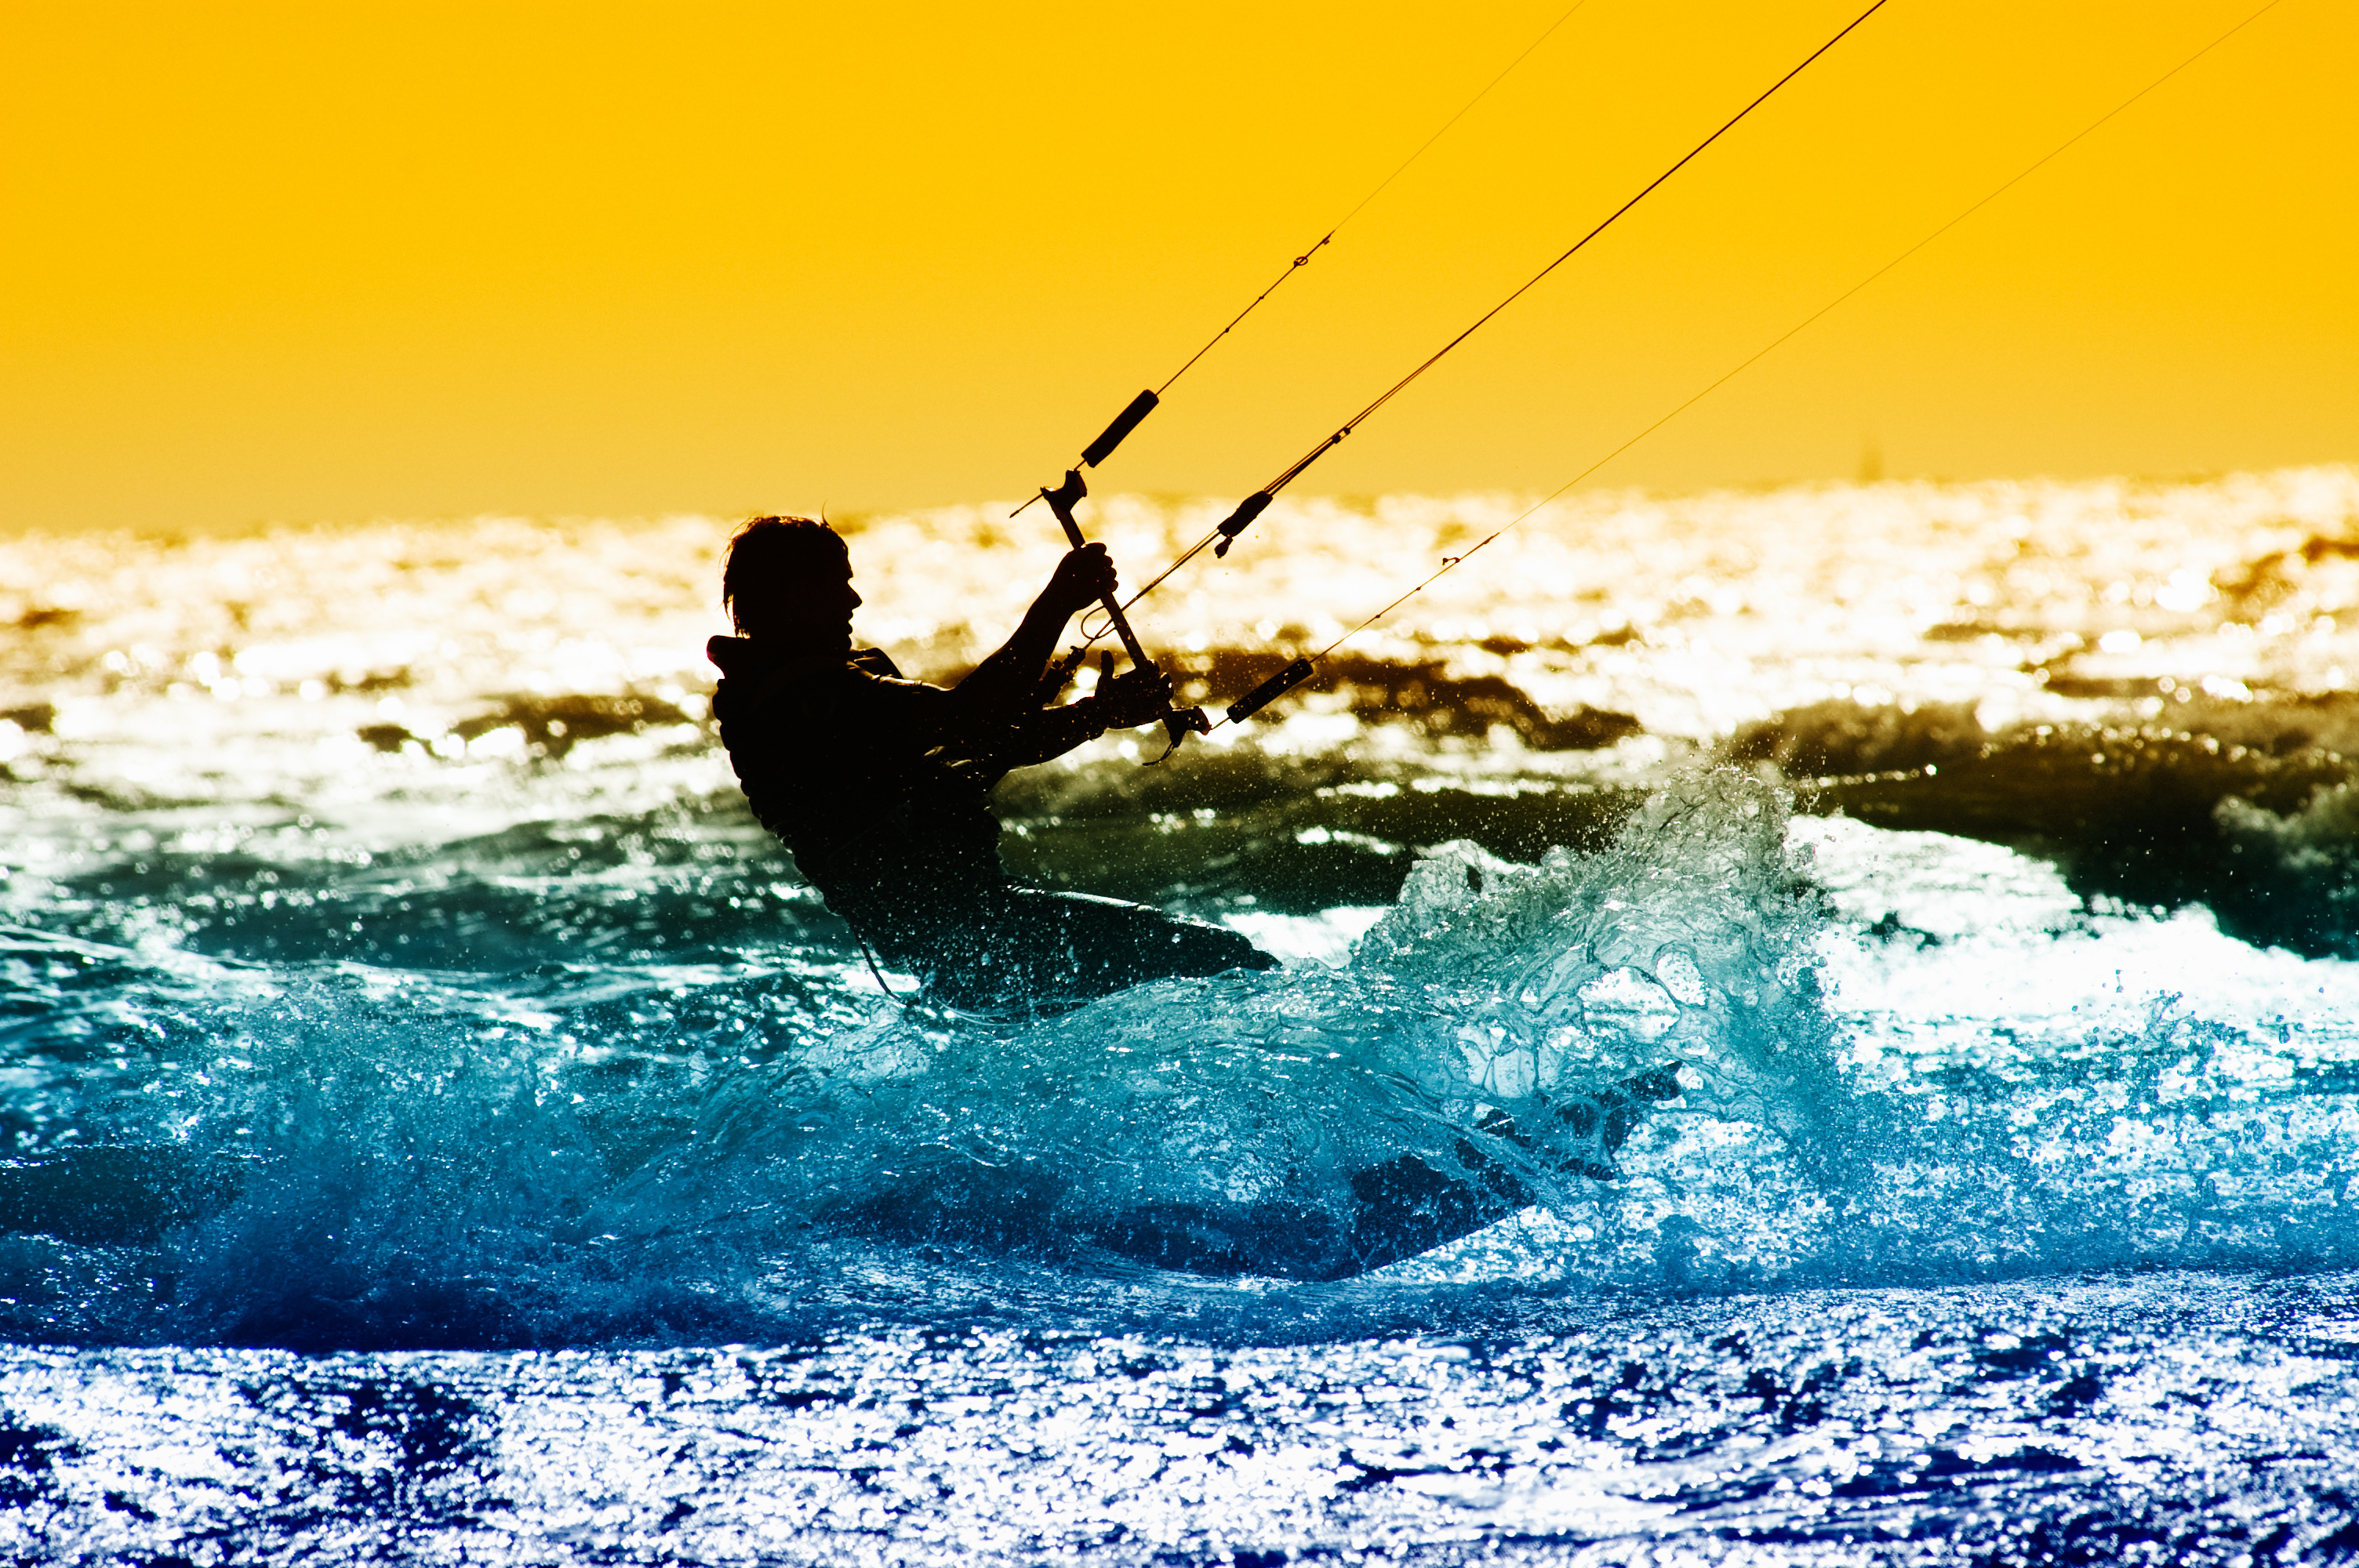 Land for sale investment property Kuta Lombok surf yoga villa subdivision hotel Mandalika international airport Rinjani pristine beach sunset sunrise hill view